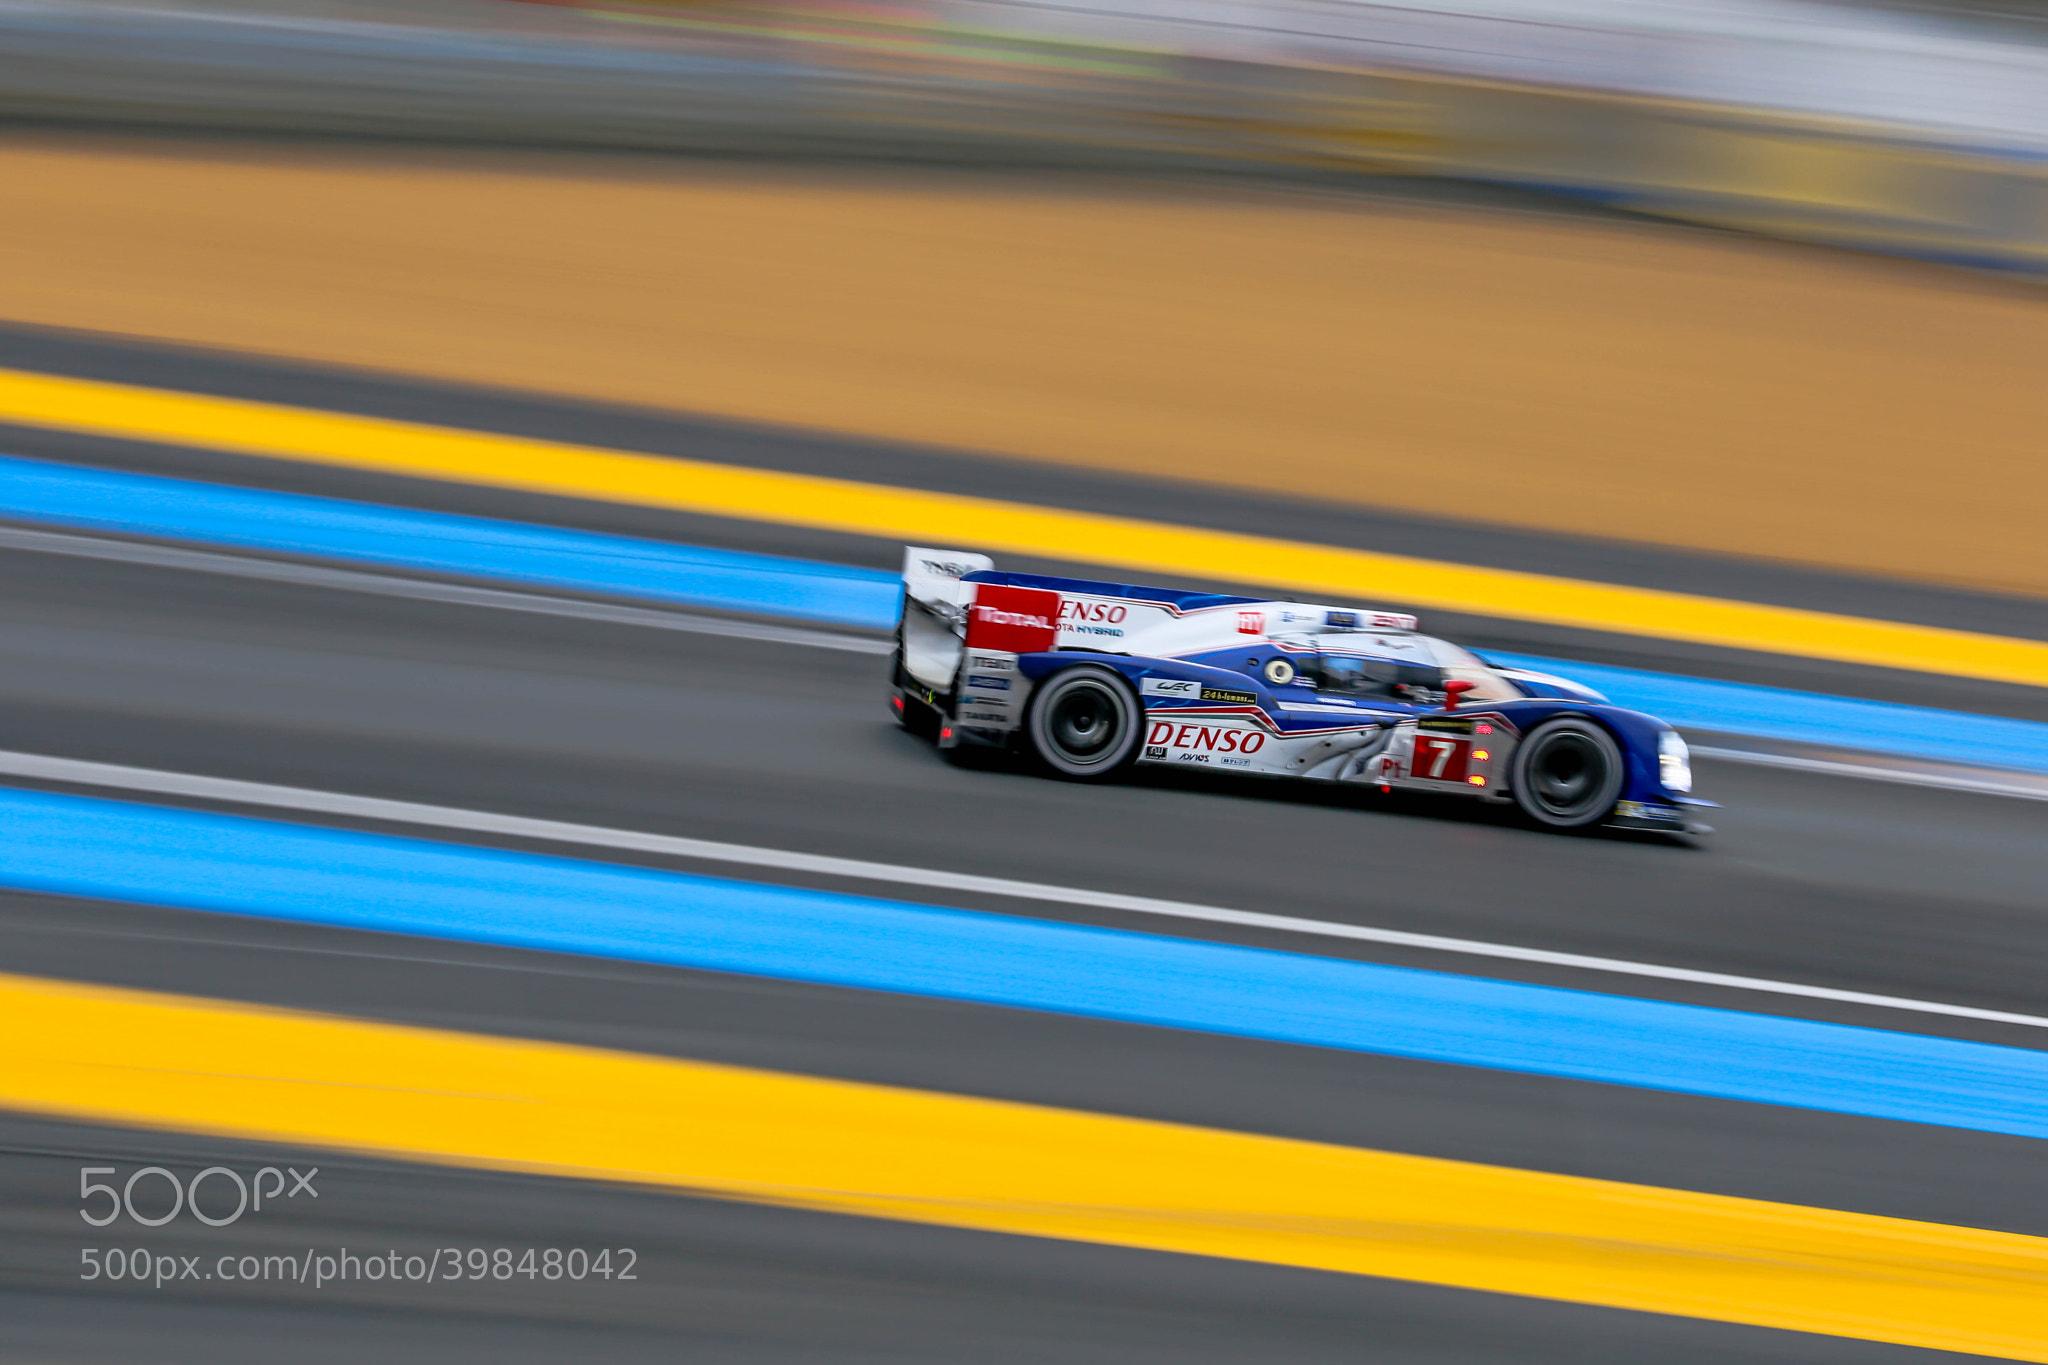 Photograph Toyota TS030 - 24h du Mans 2013 by Bruno Vandevelde on 500px